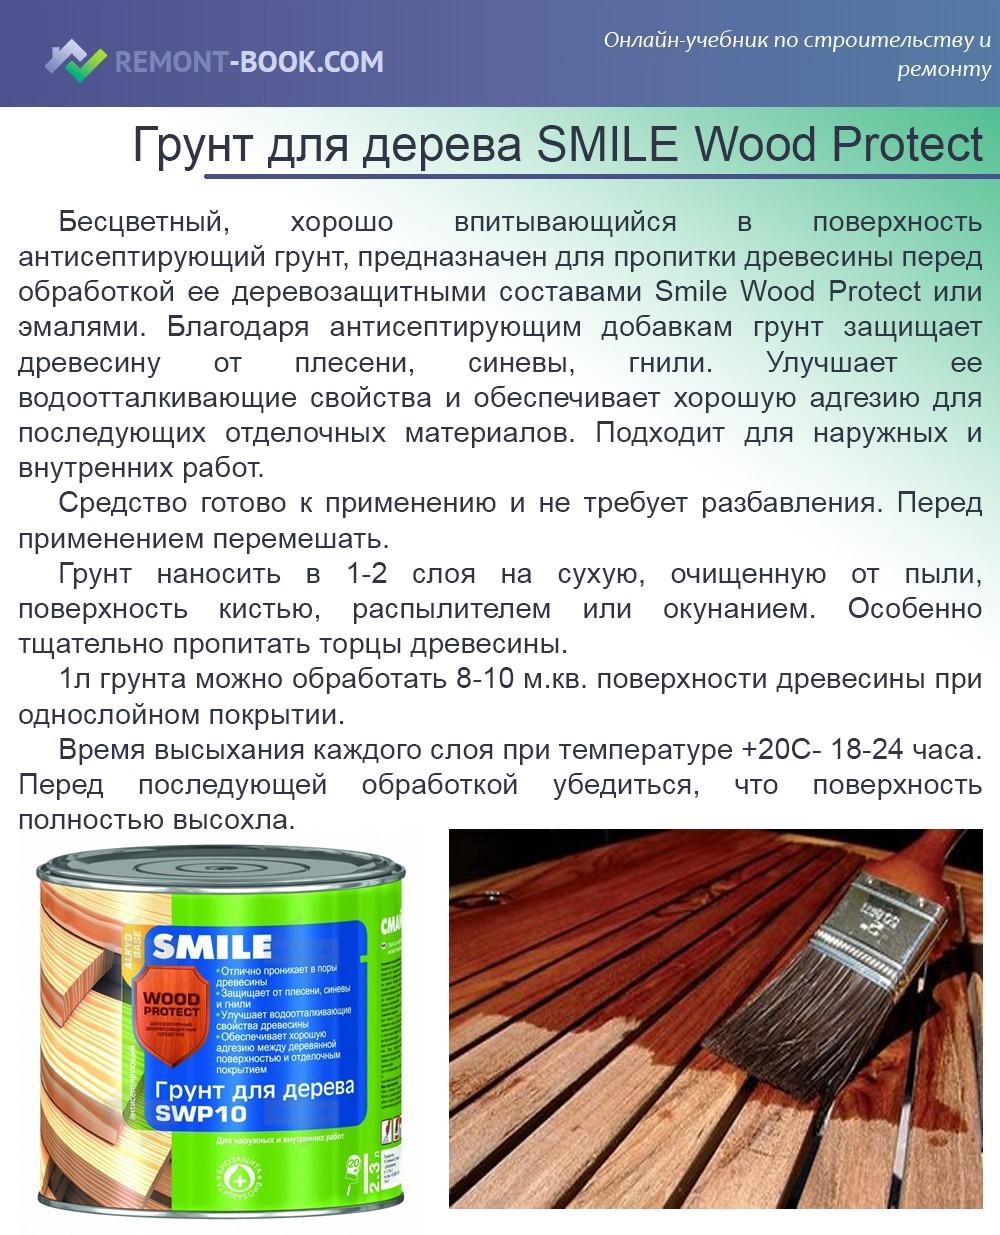 Грунт для дерева SMILE Wood Protect